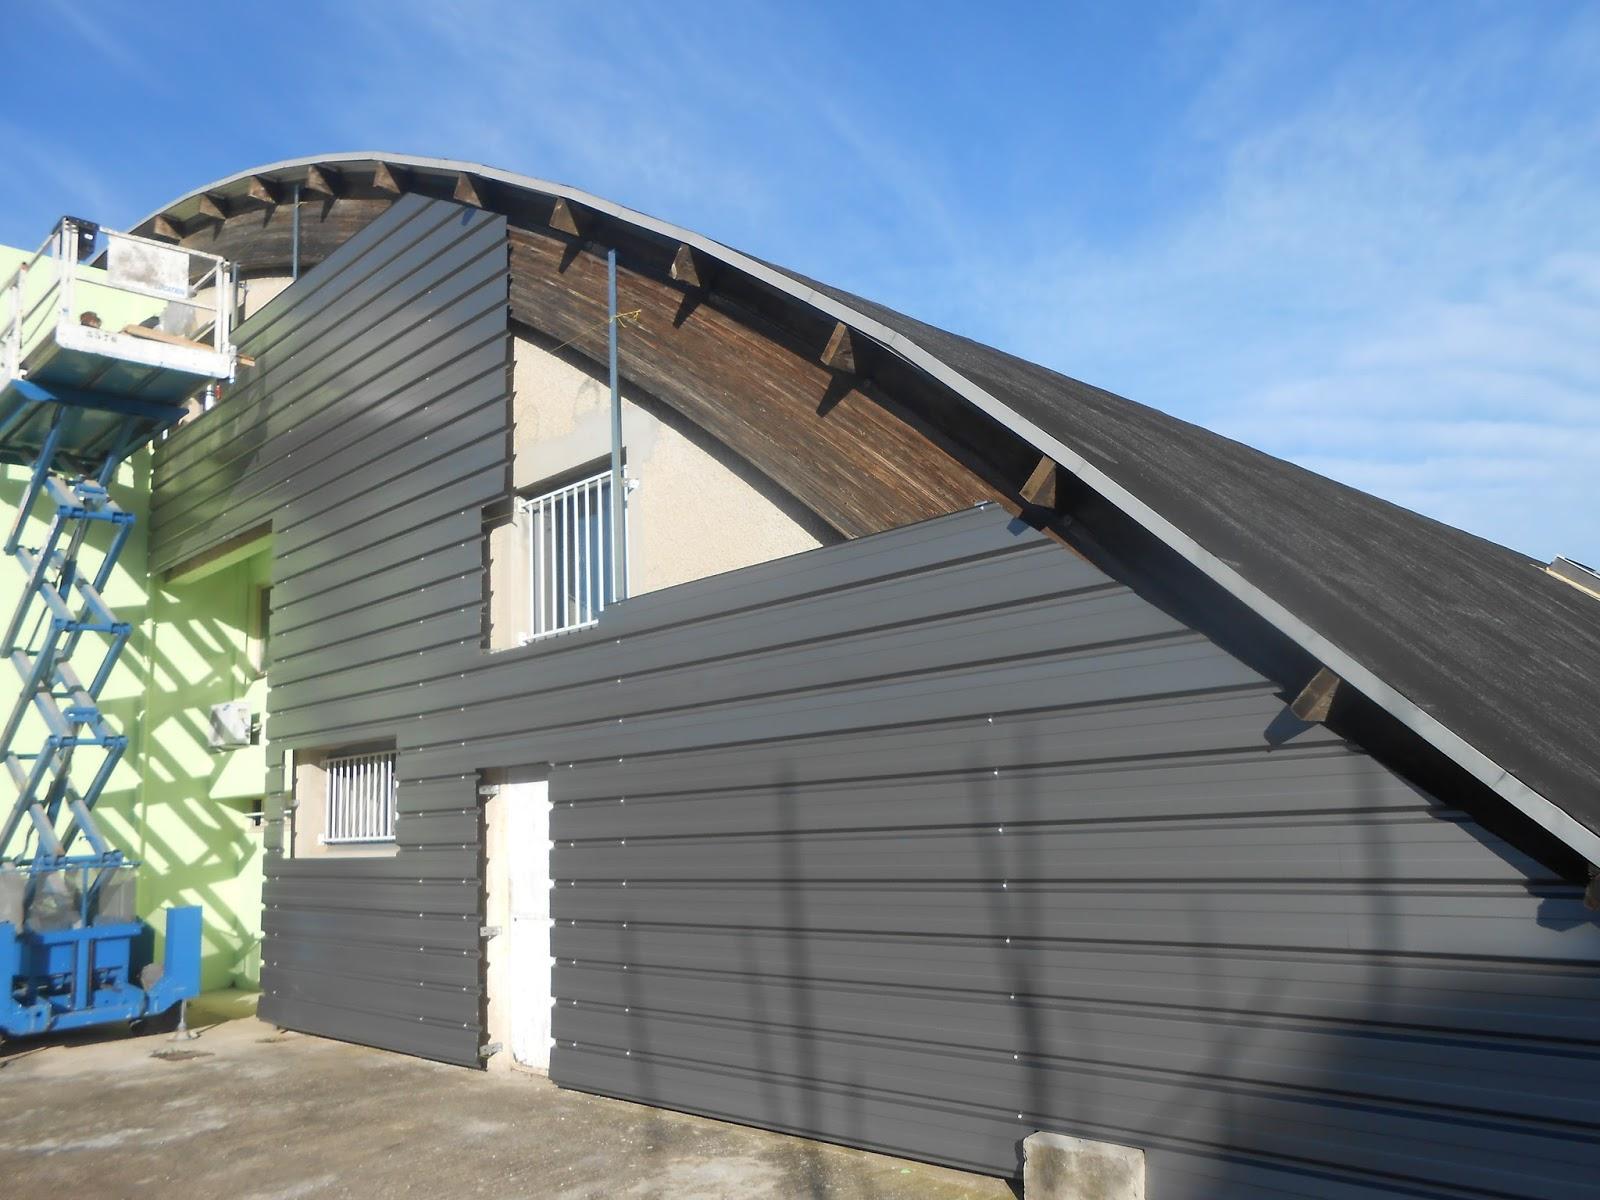 Structures metallique bardage charpente couverture for Structure metallique architecture